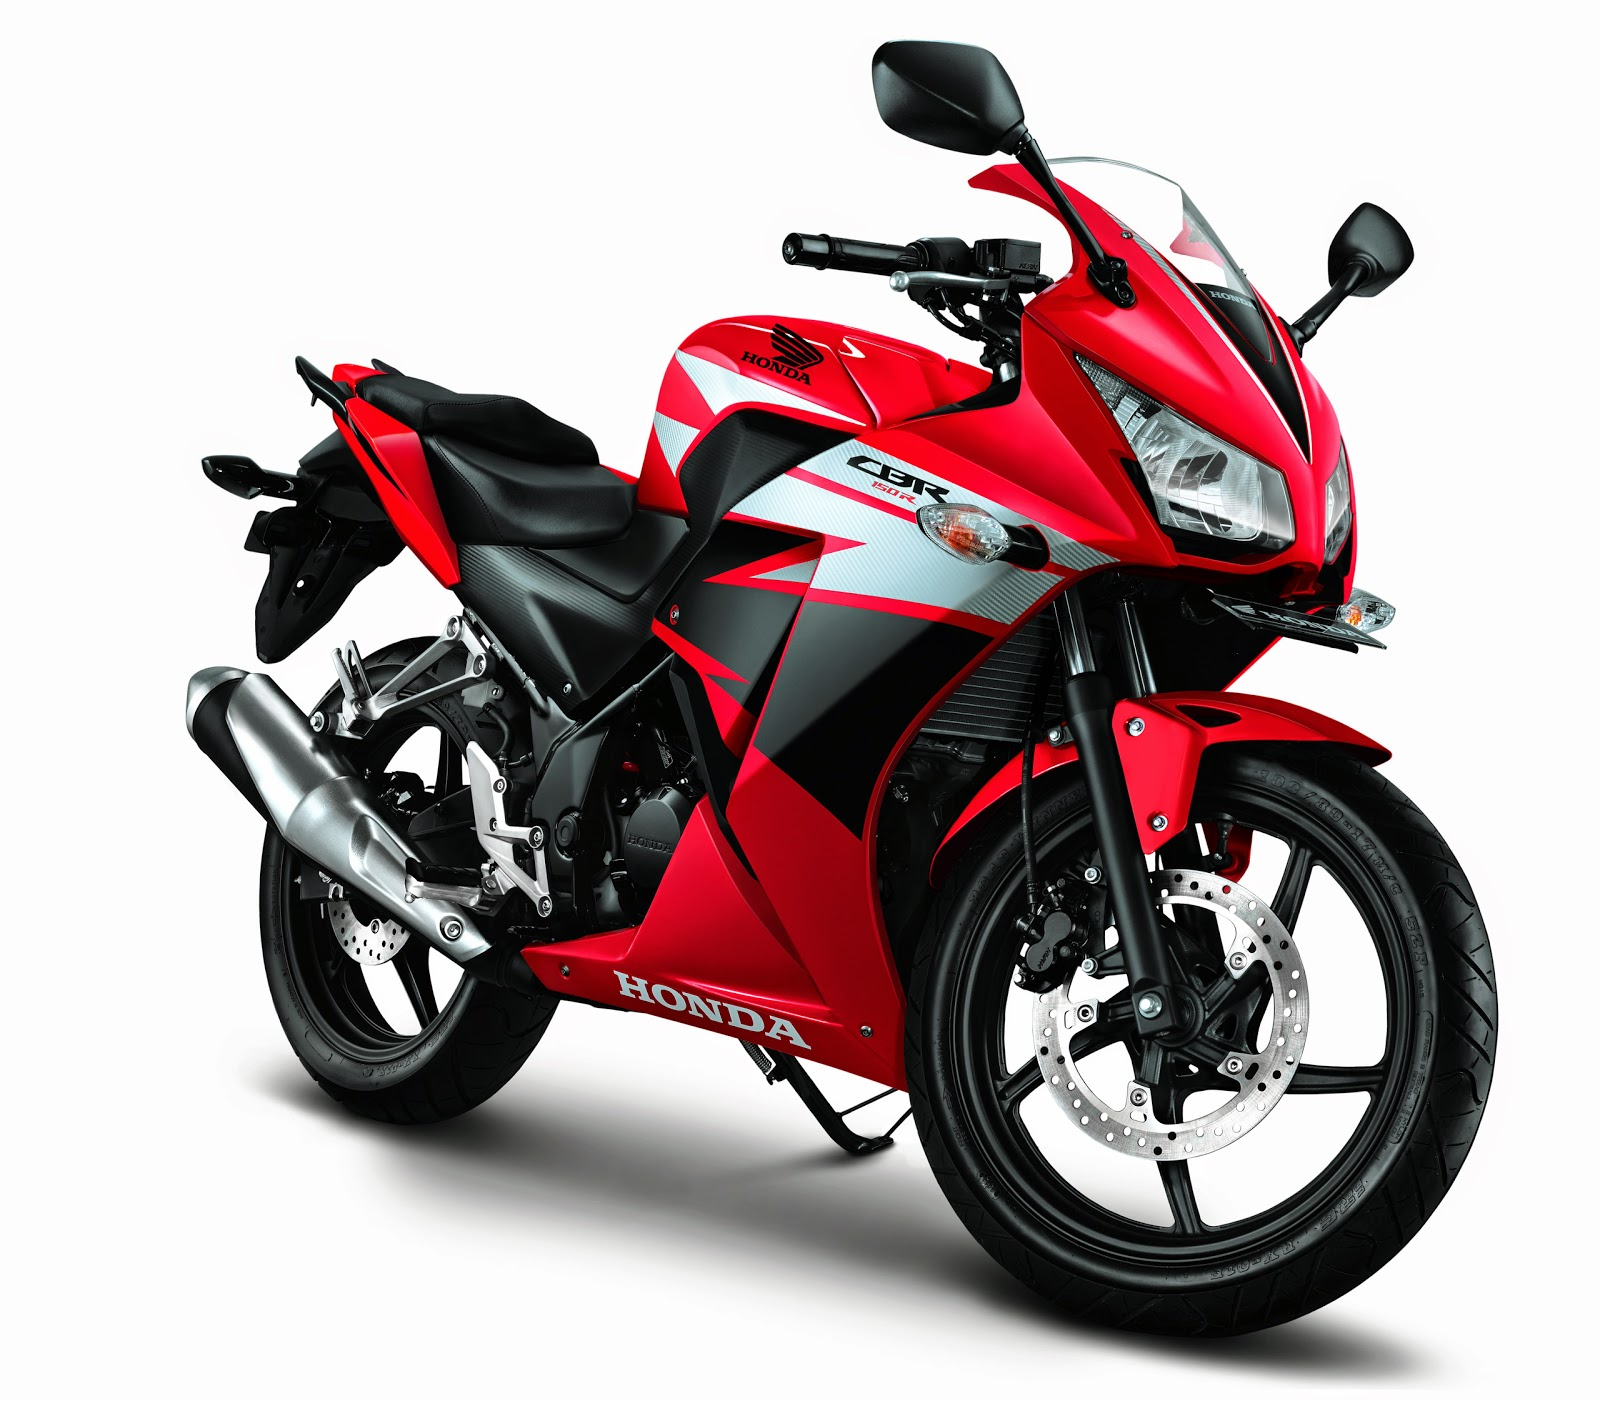 Kredit Sepeda Motor Honda Beat Malang All New Sporty Esp Cbs Funk Red Black Kudus Daftar Harga Dijual Bekas Di Termurah Terlengkap 2018